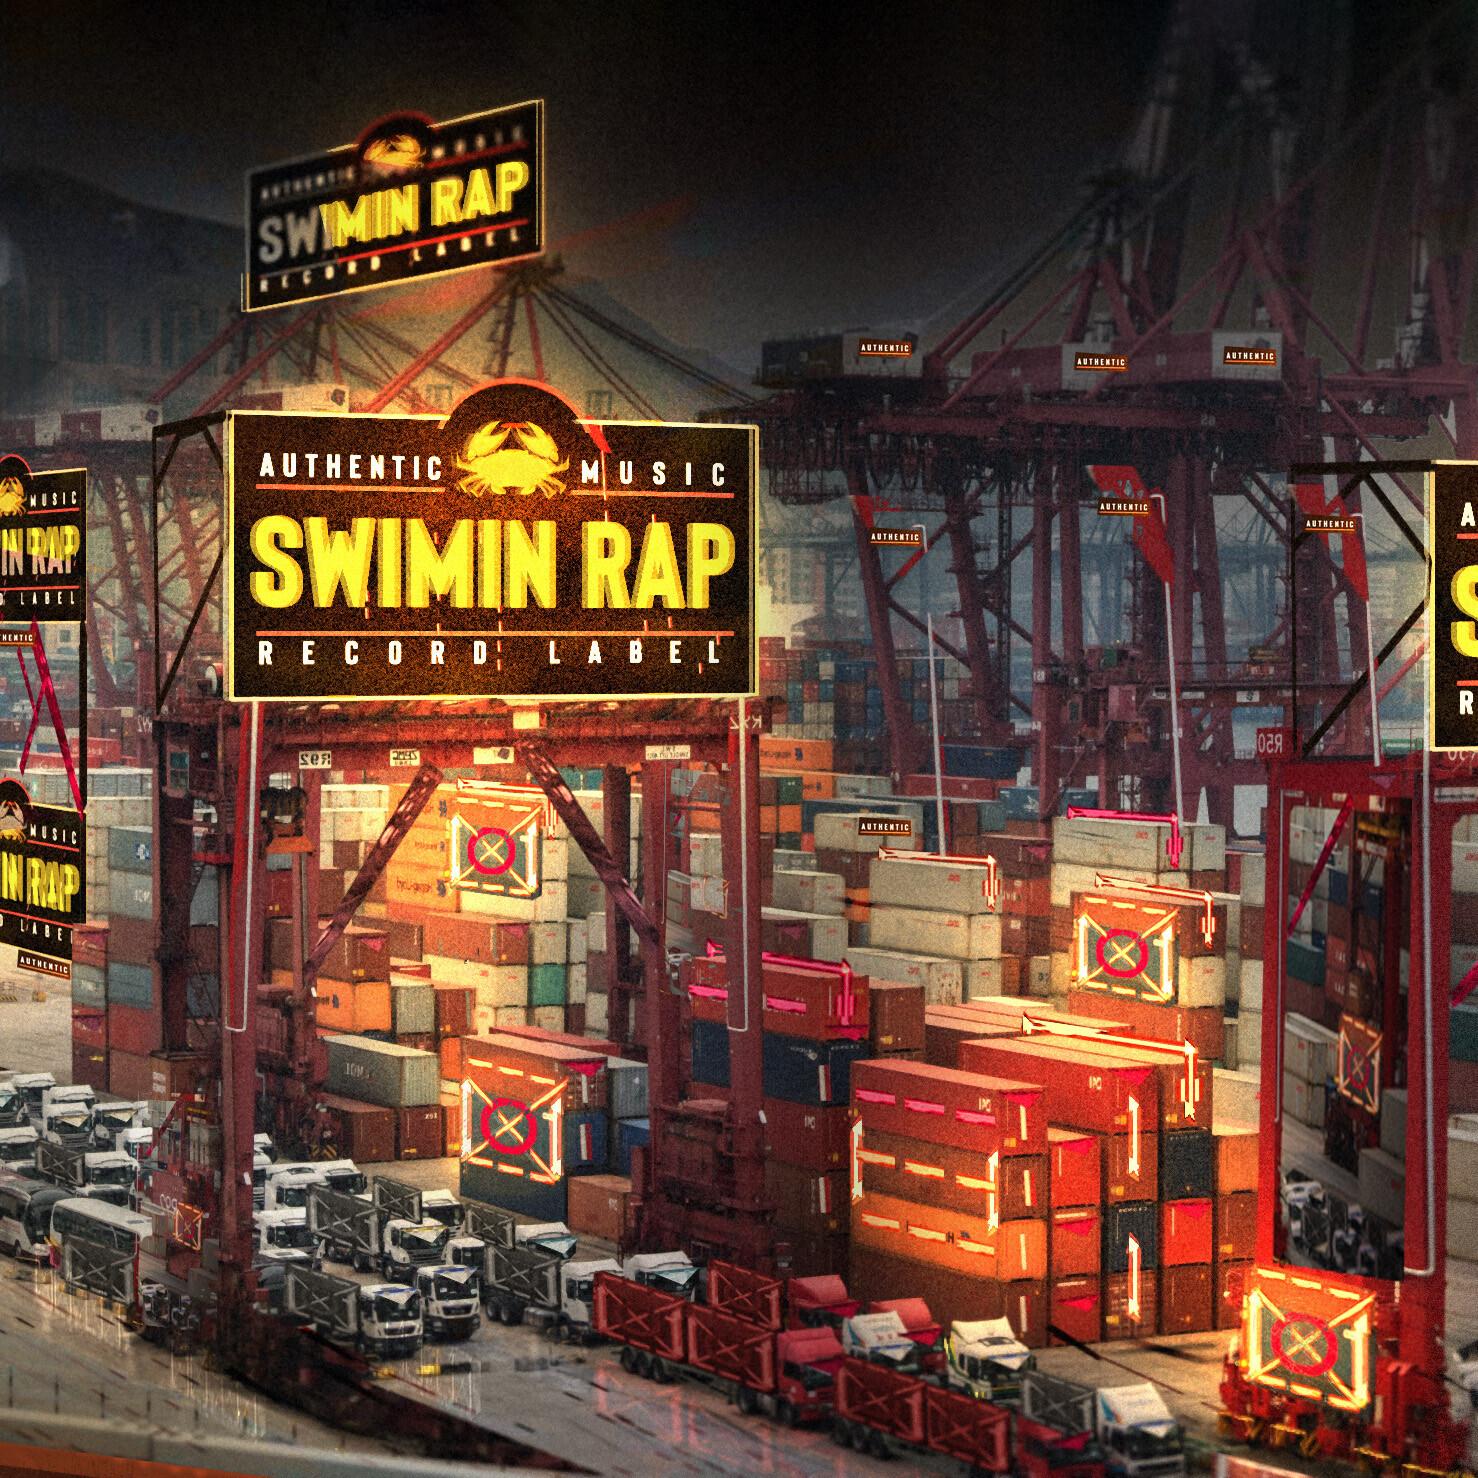 SWIMIN RAP Concert